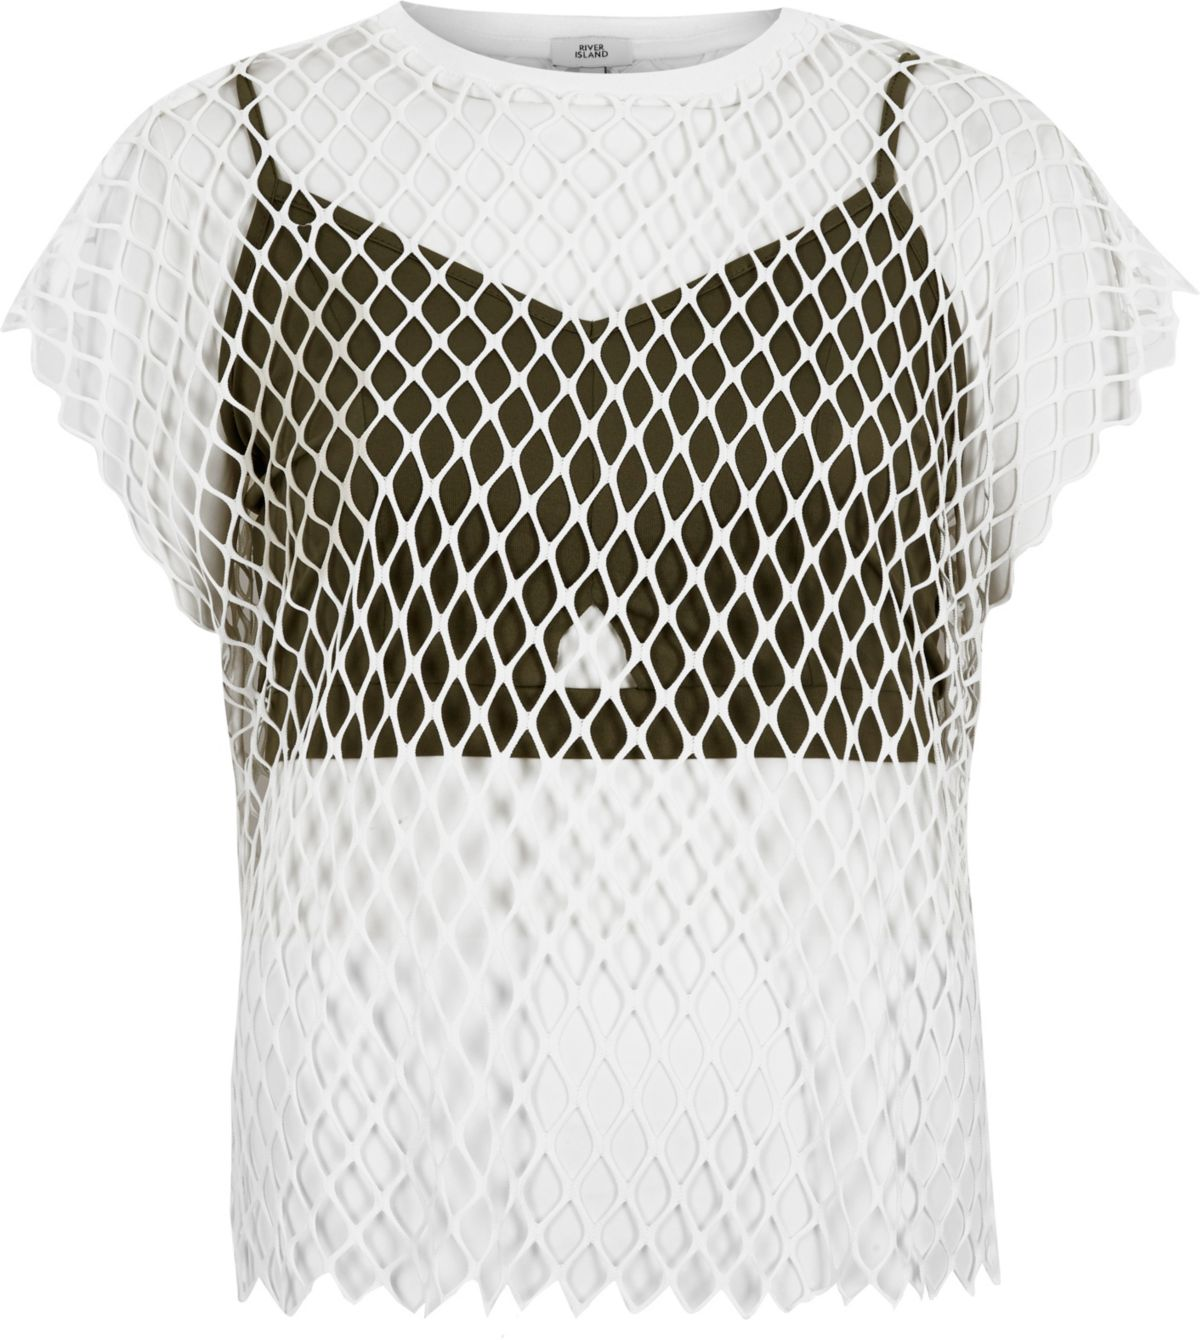 White mesh bralette T-shirt